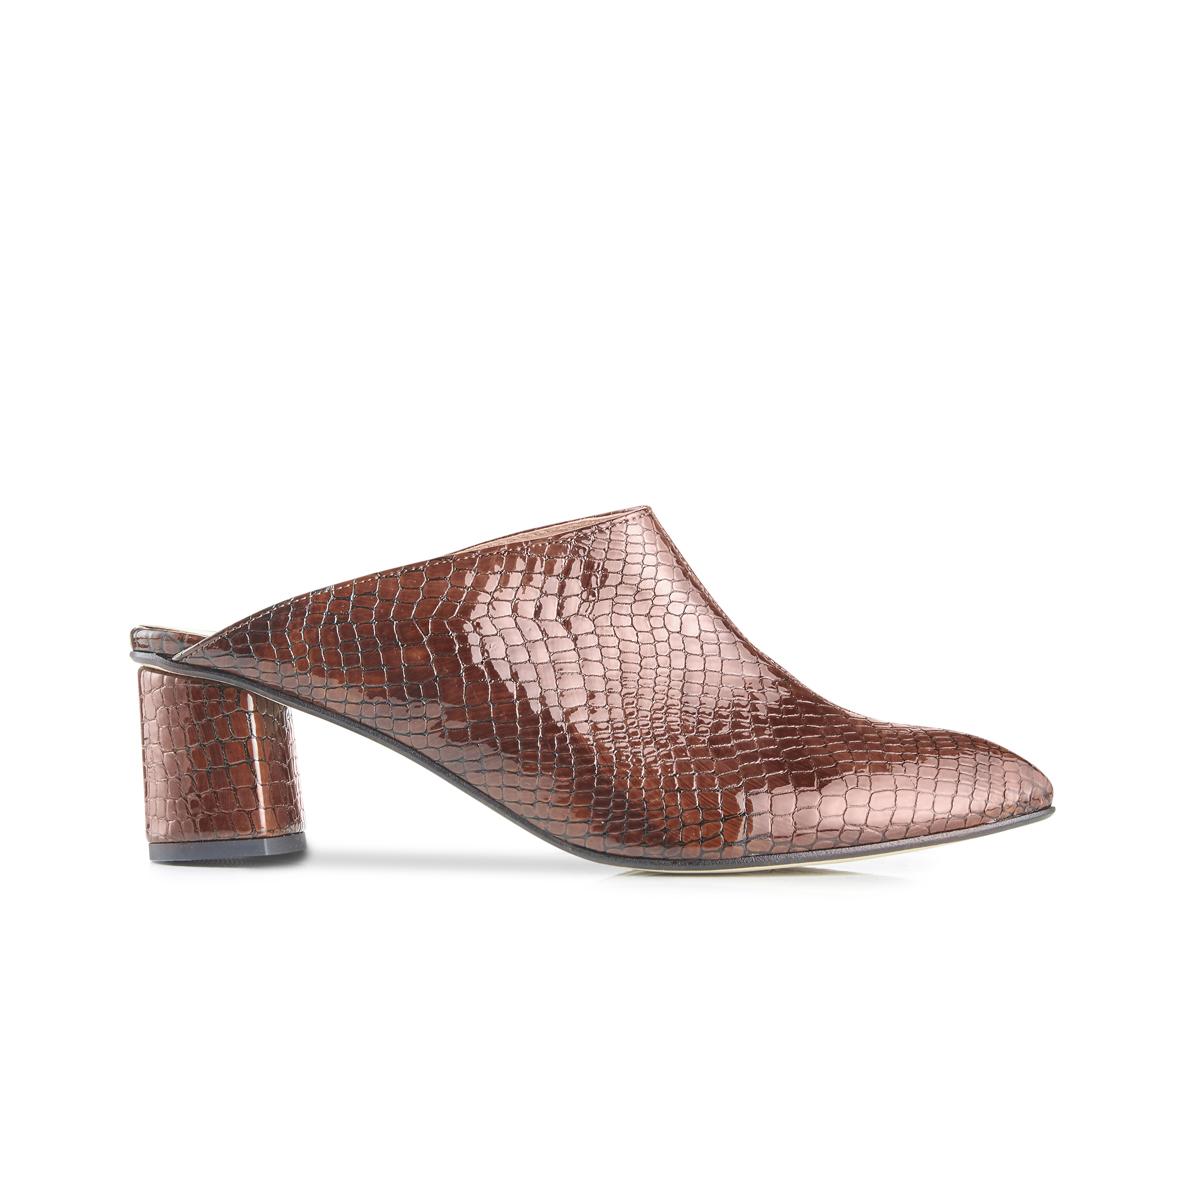 Lou croc leather block heel mules - brown